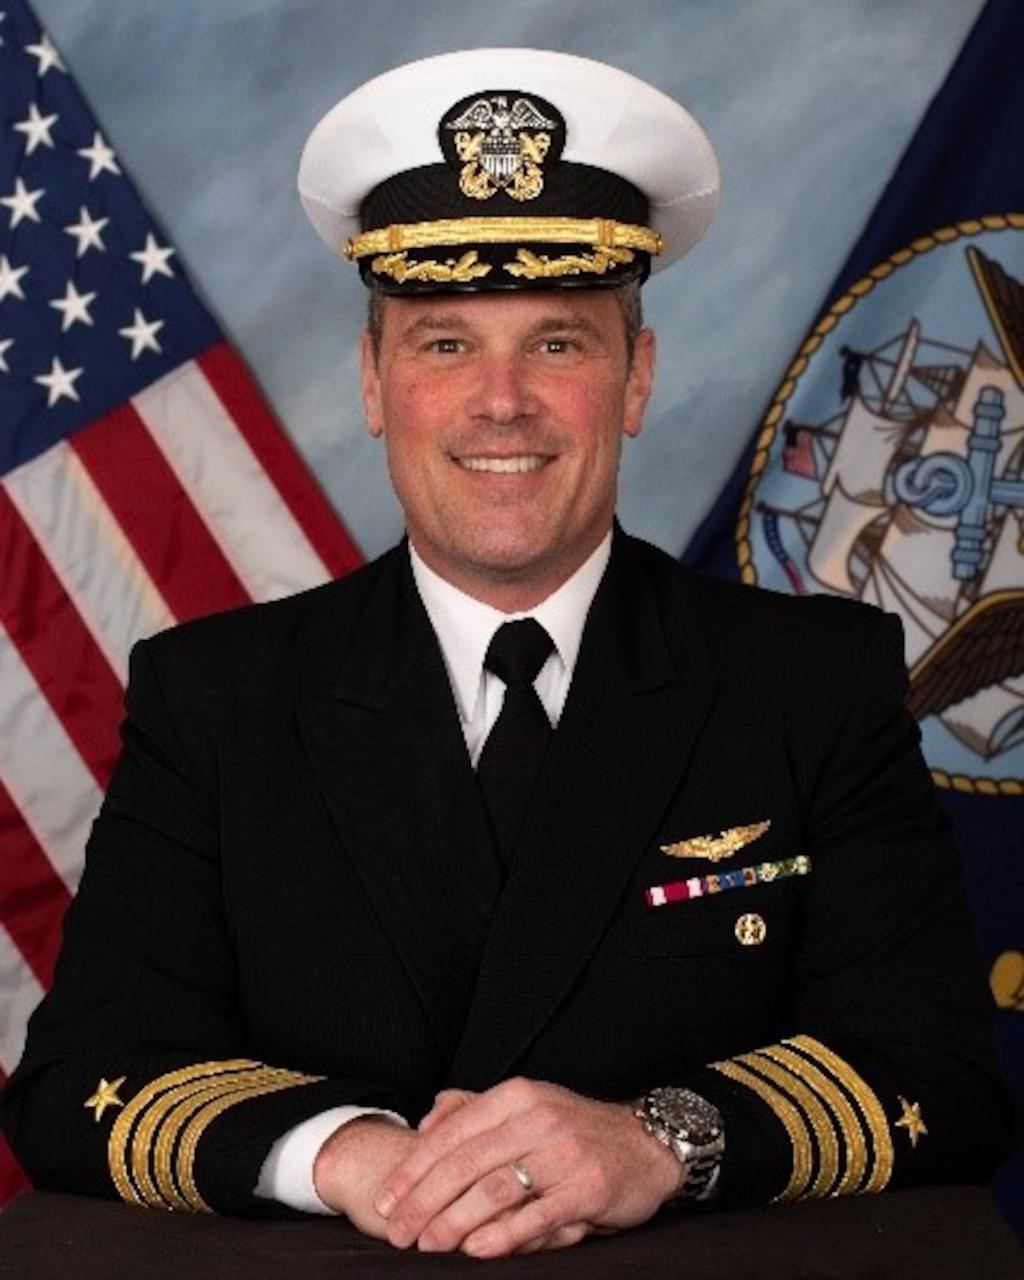 Official biography photo of Capt. Daniel Quinn, deputy commander, Strike Fighter Wing, U.S. Pacific Fleet.